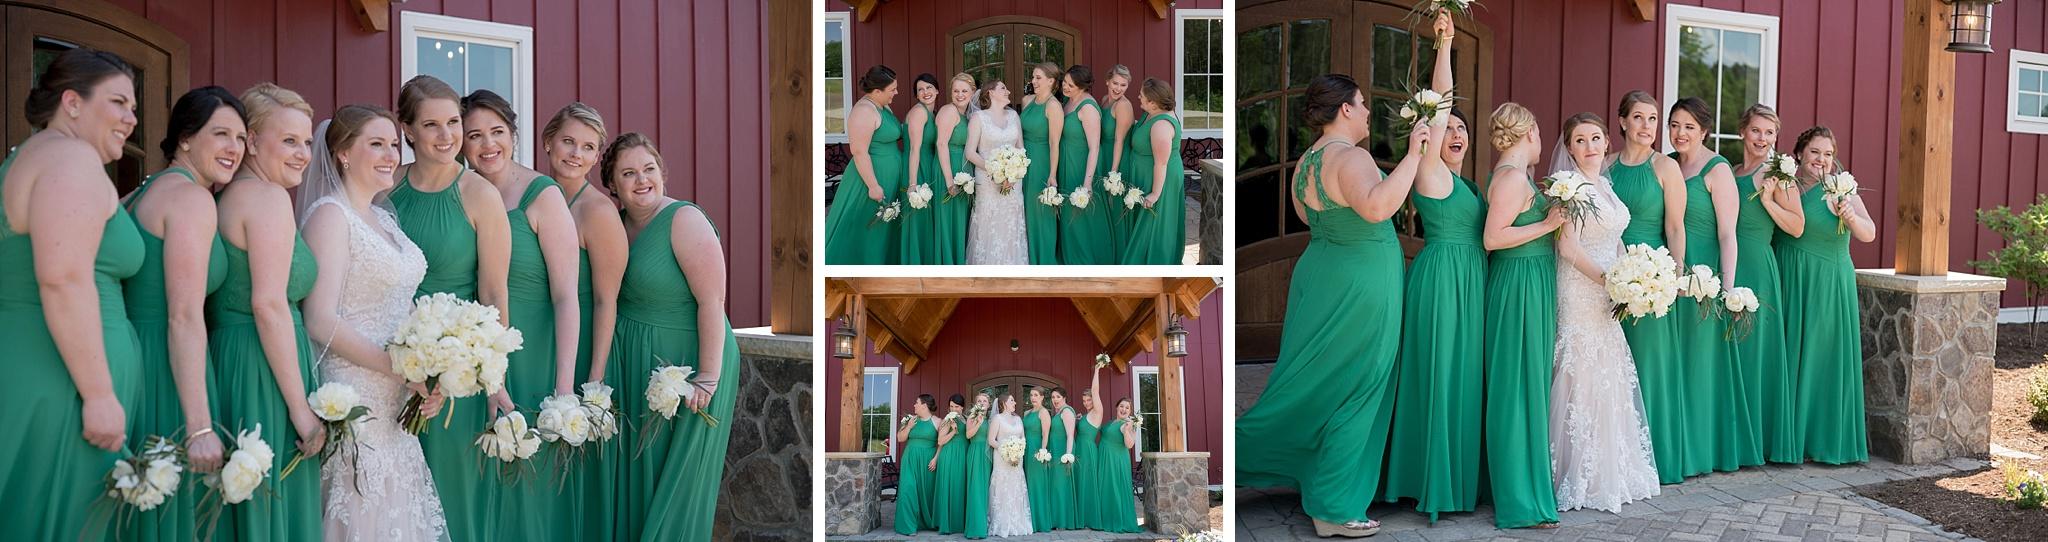 Pavilion-Carriage-Farms-Wedding-Photographer-202.jpg